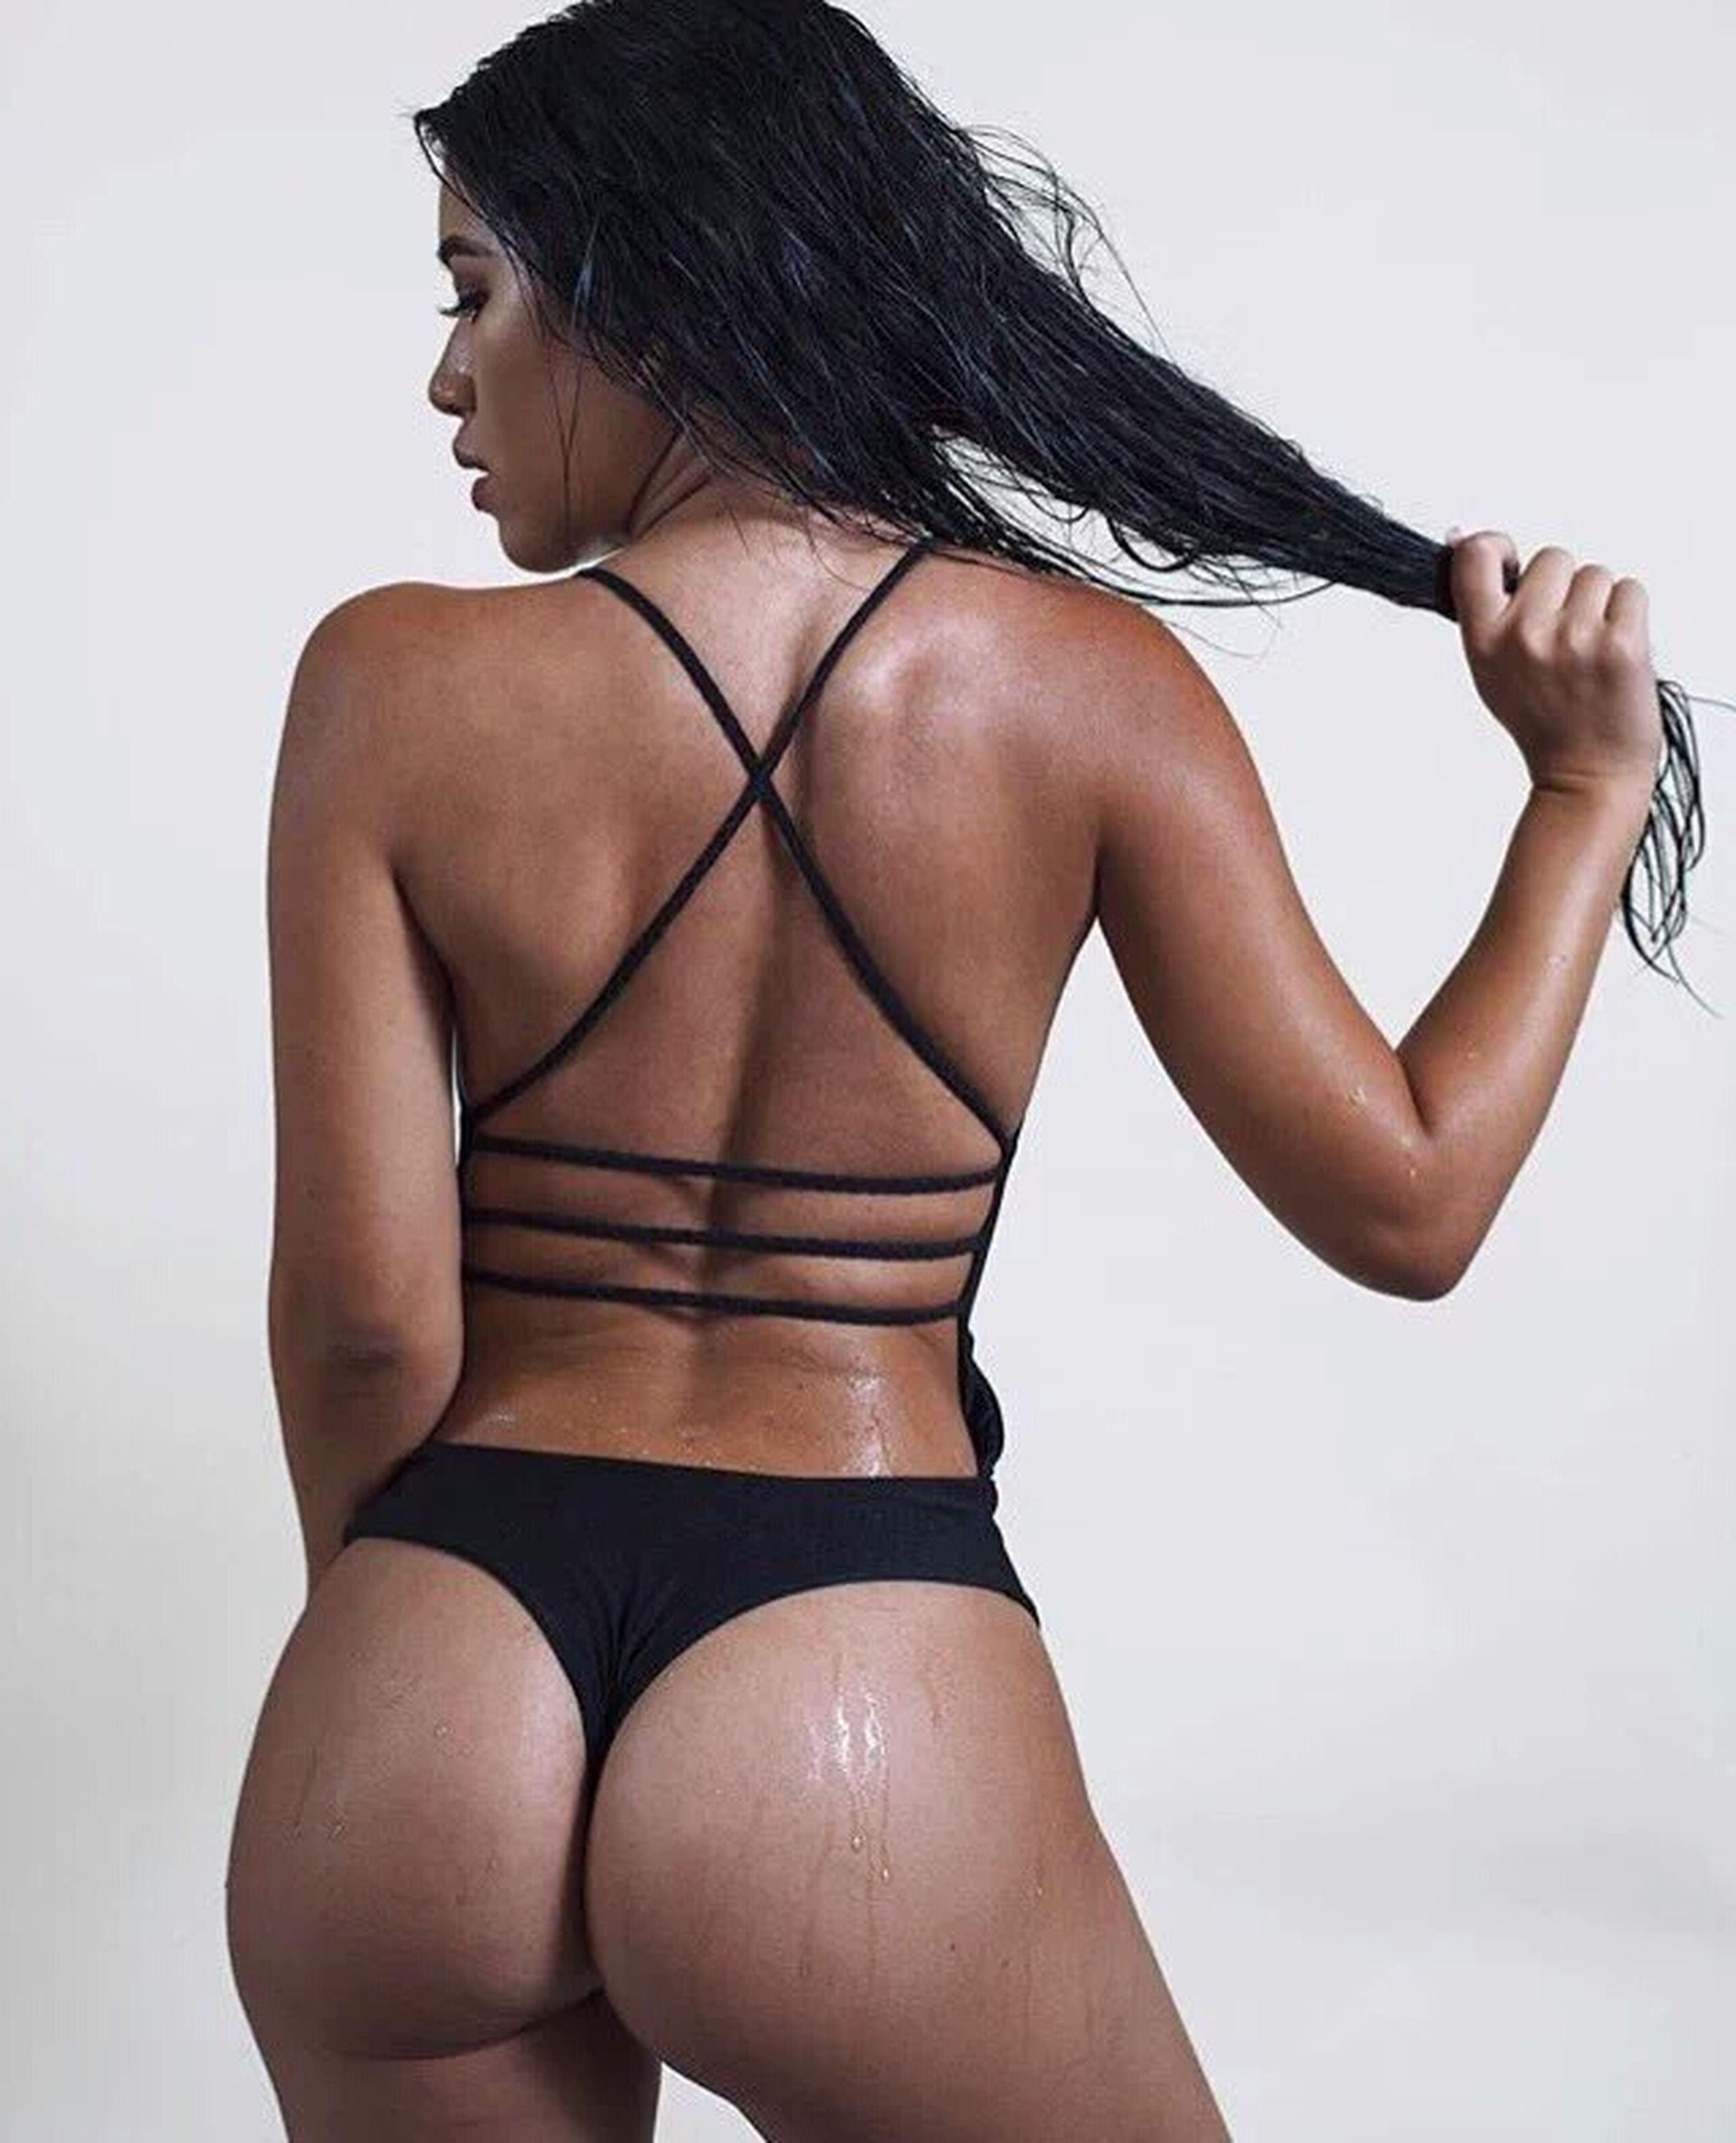 Julia Kelly | EyeEm